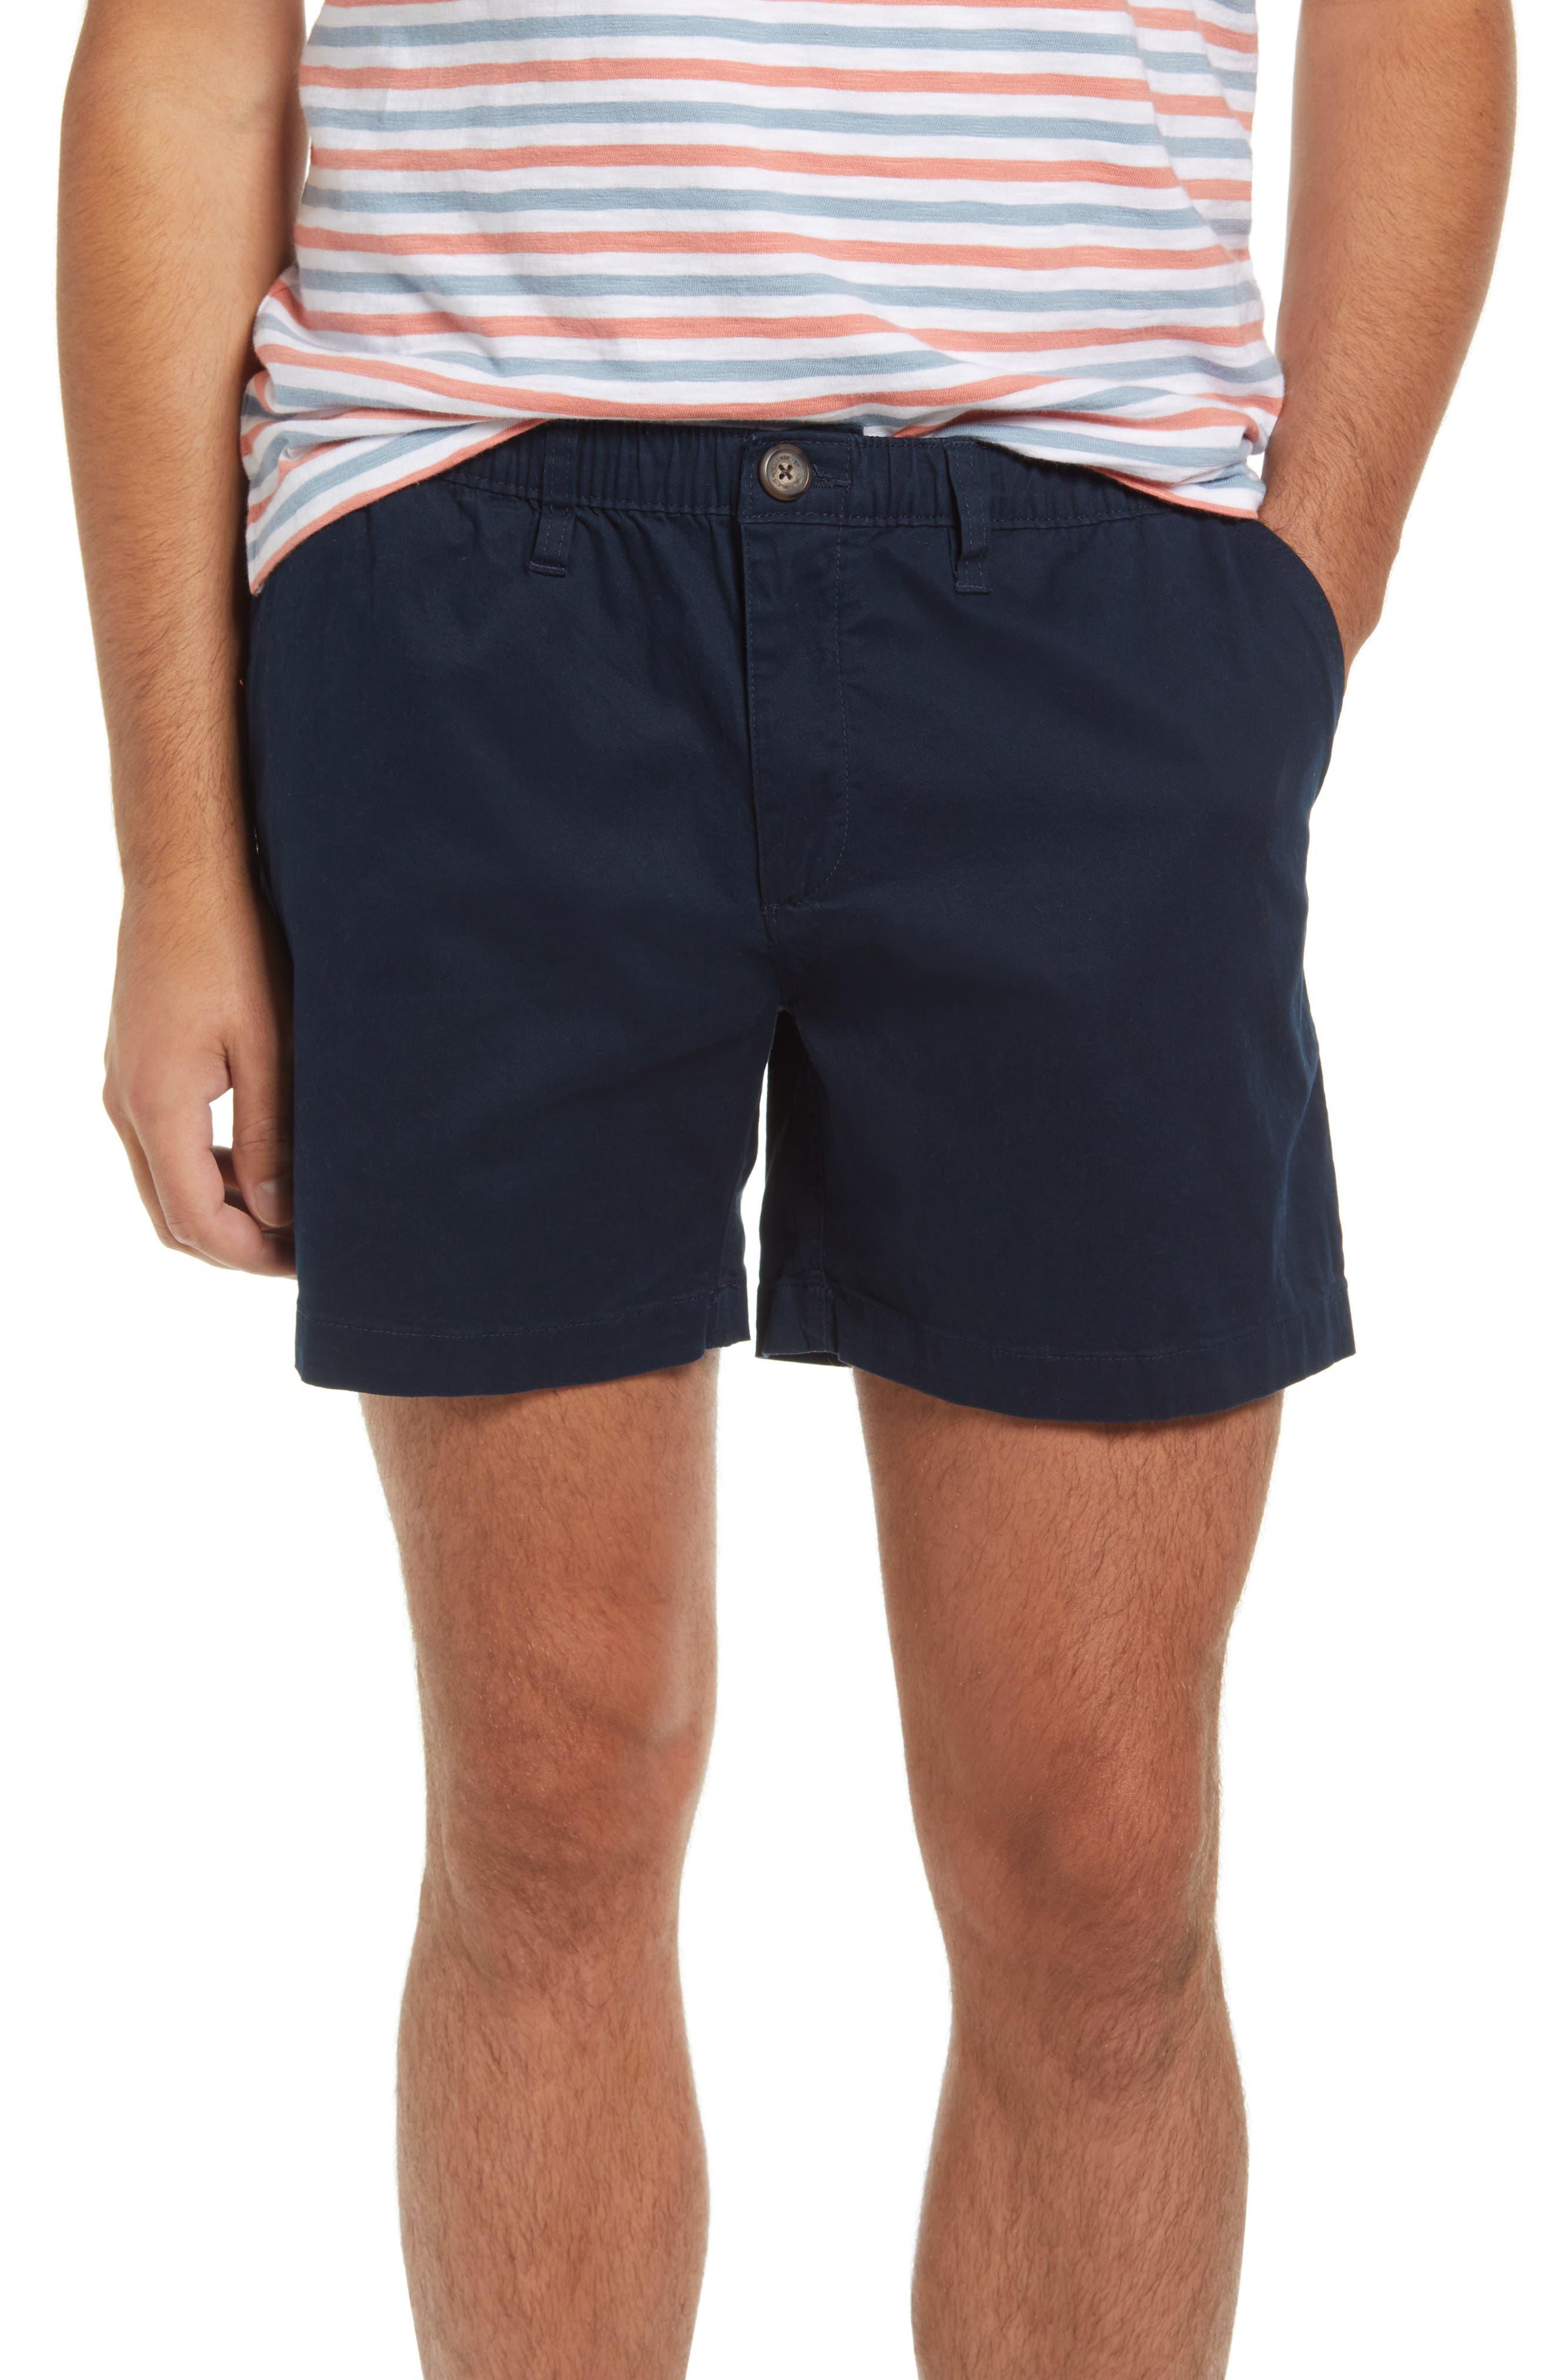 The Armadas 5.5-Inseam Stretch Shorts